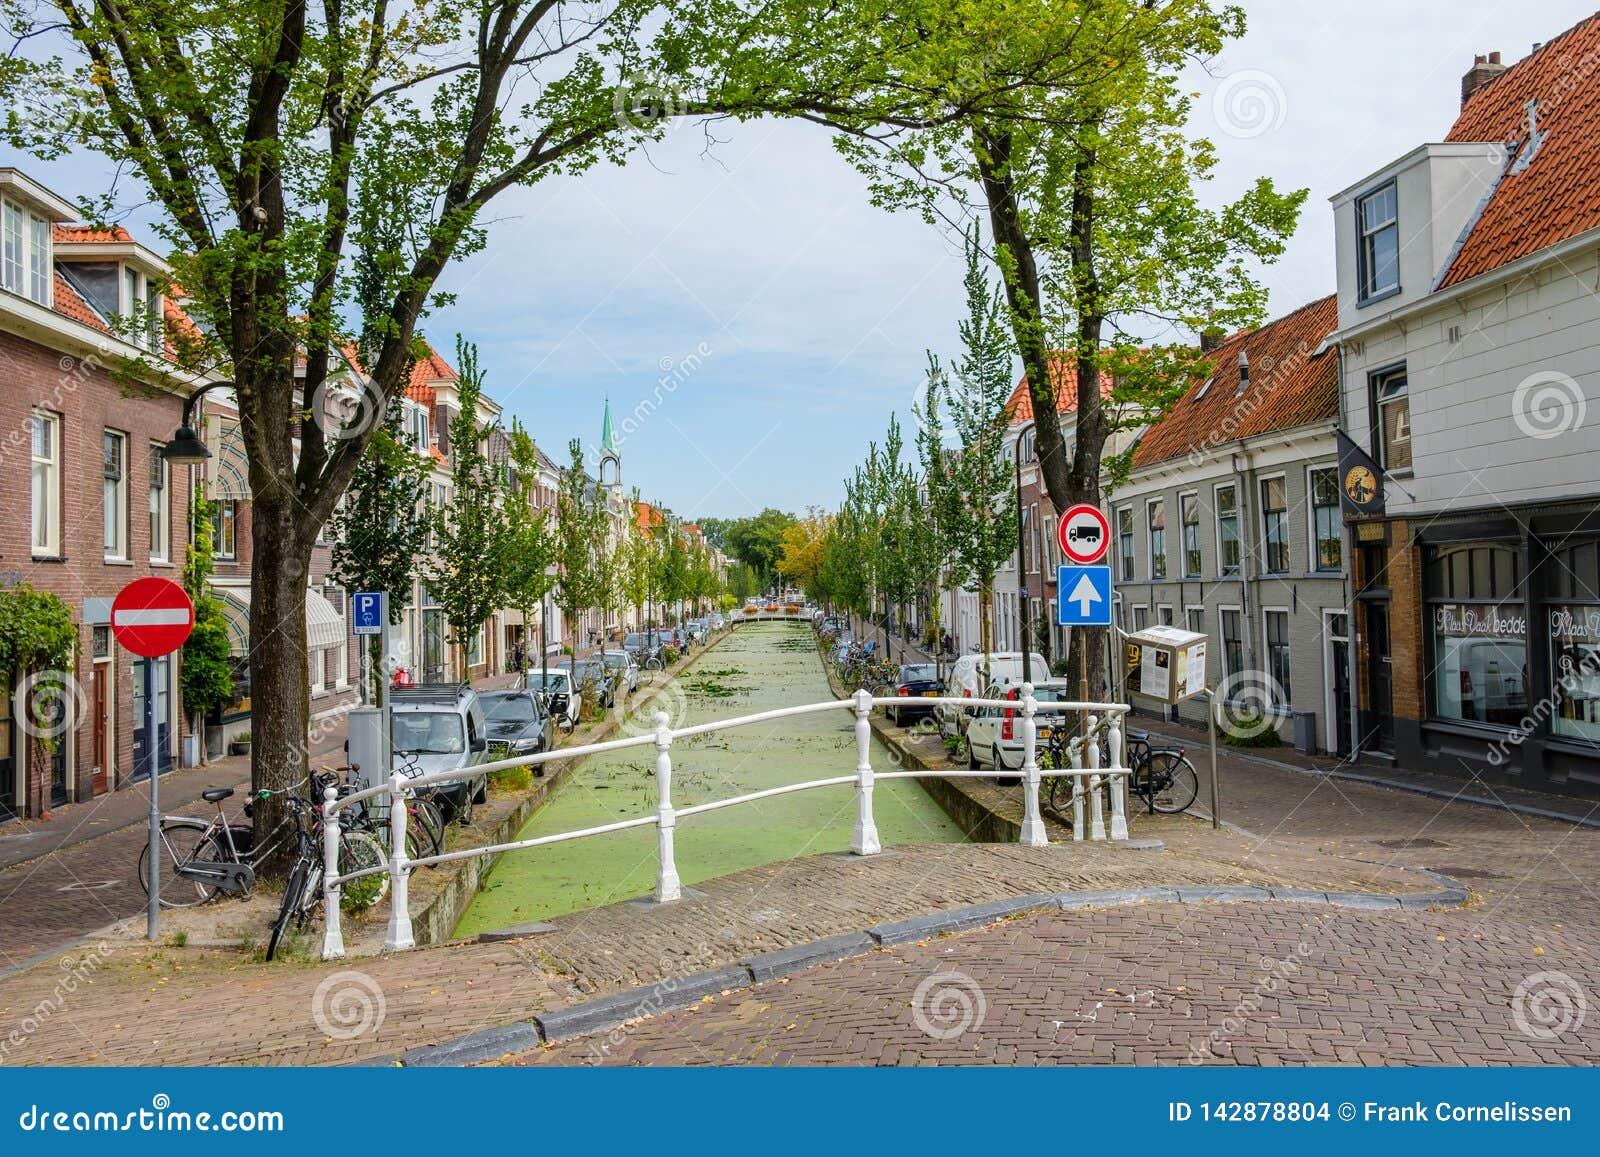 Piękny historyczny stary kanał w centrum Delft, holandie